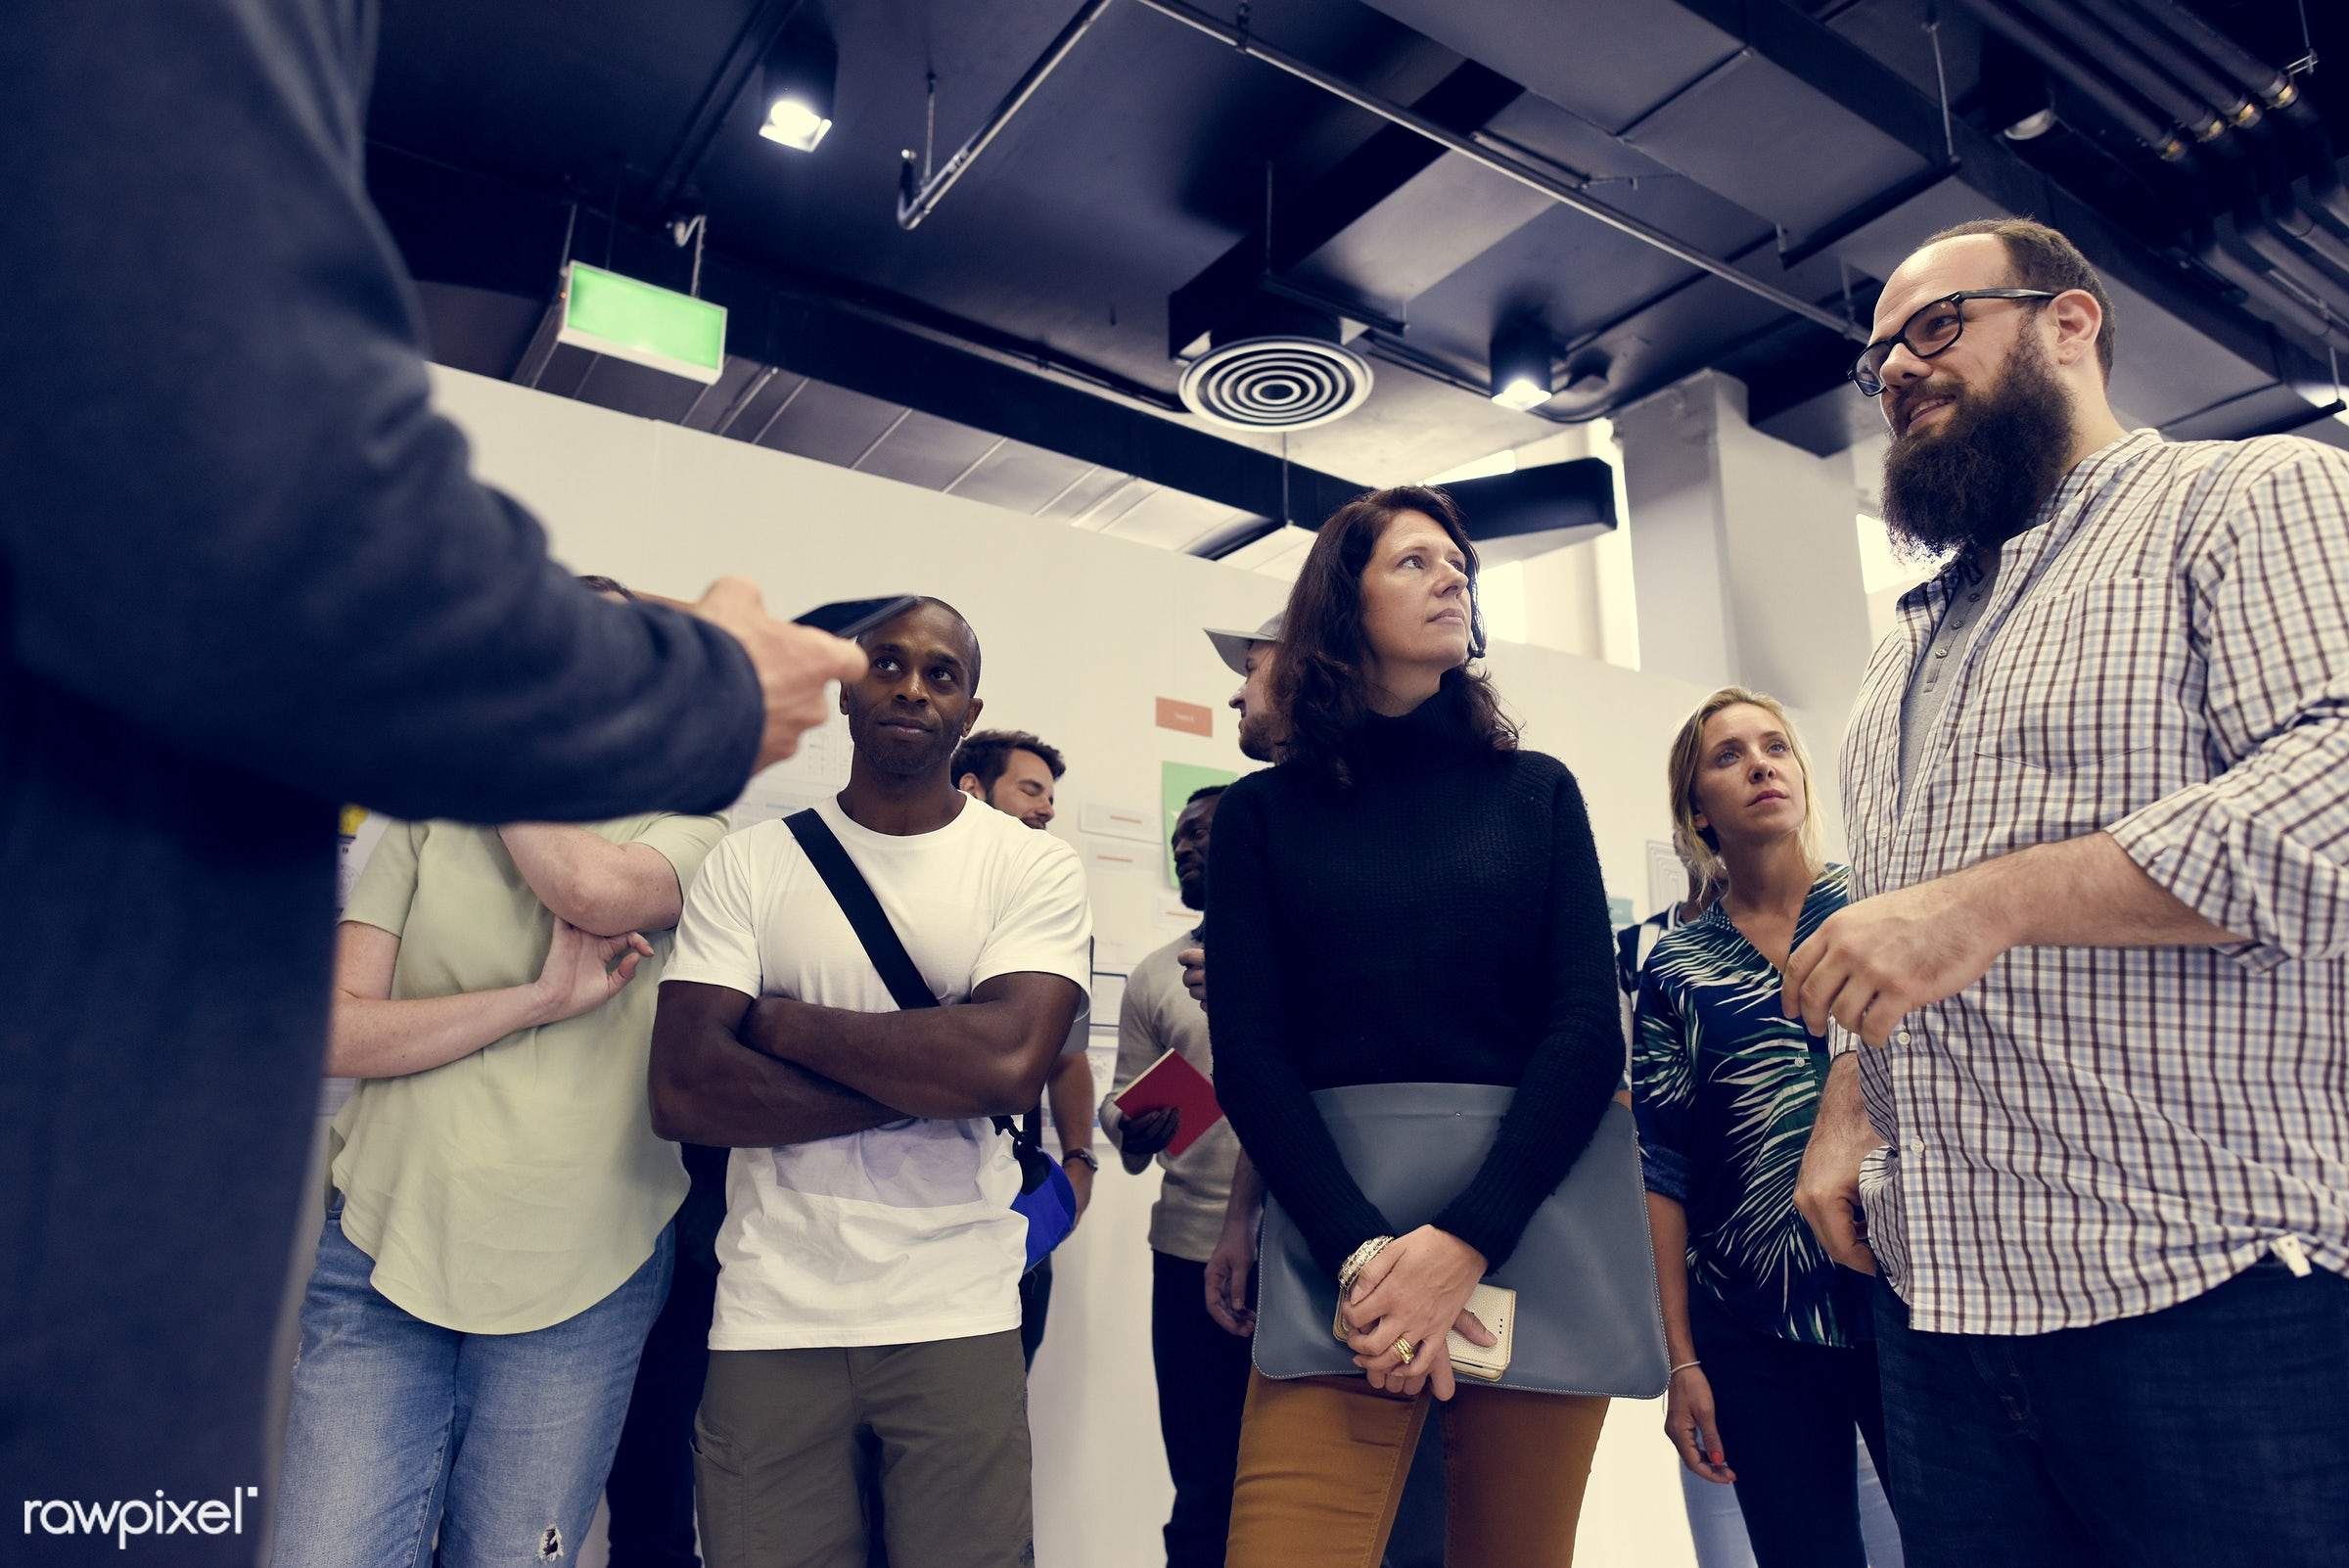 attend, brainstorm, business, casual, caucasian, class, colleagues, company, course, coworking, creative, development,...